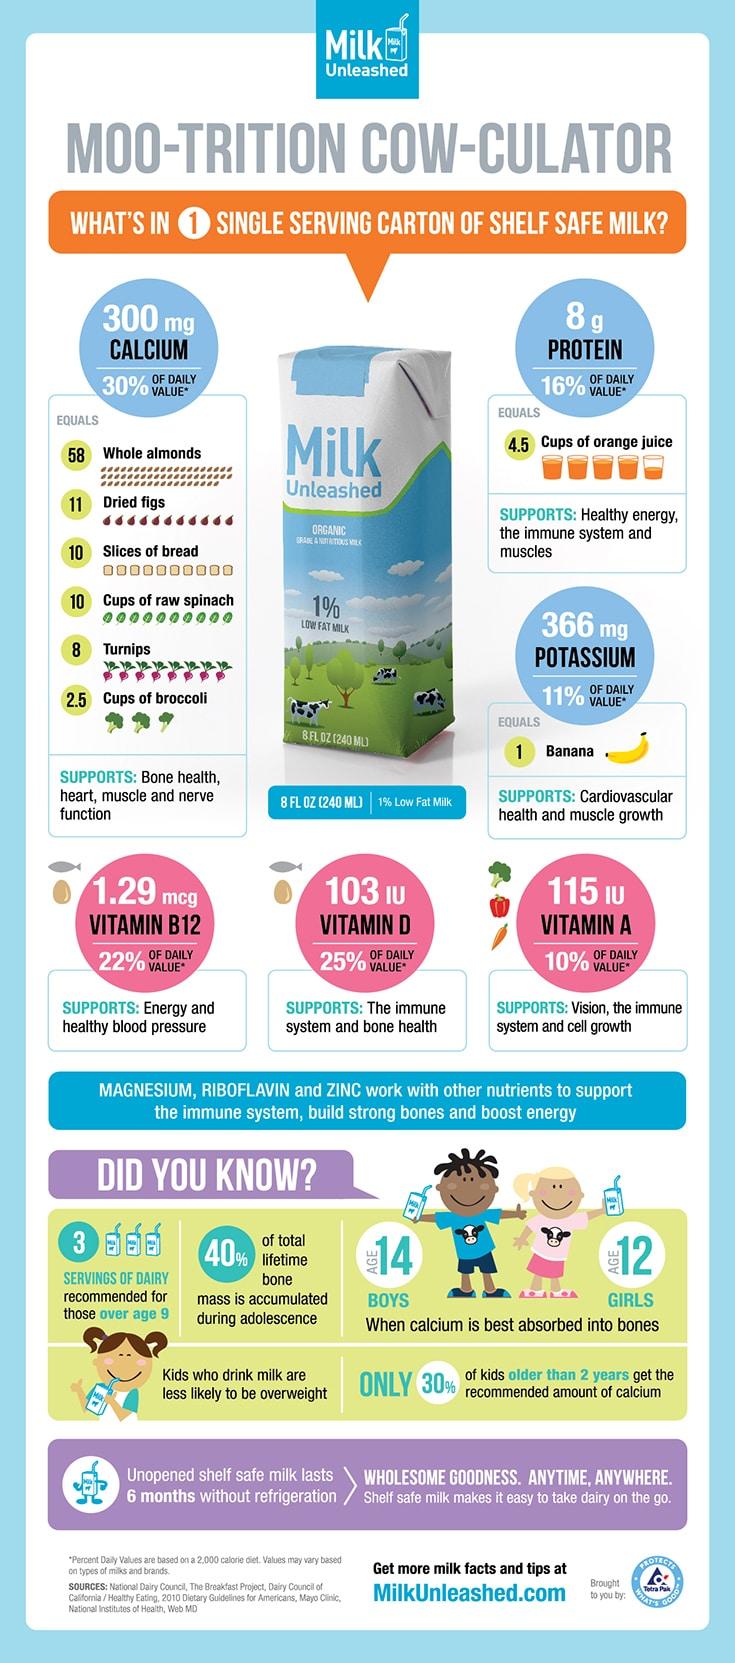 Milk Unleashed Info